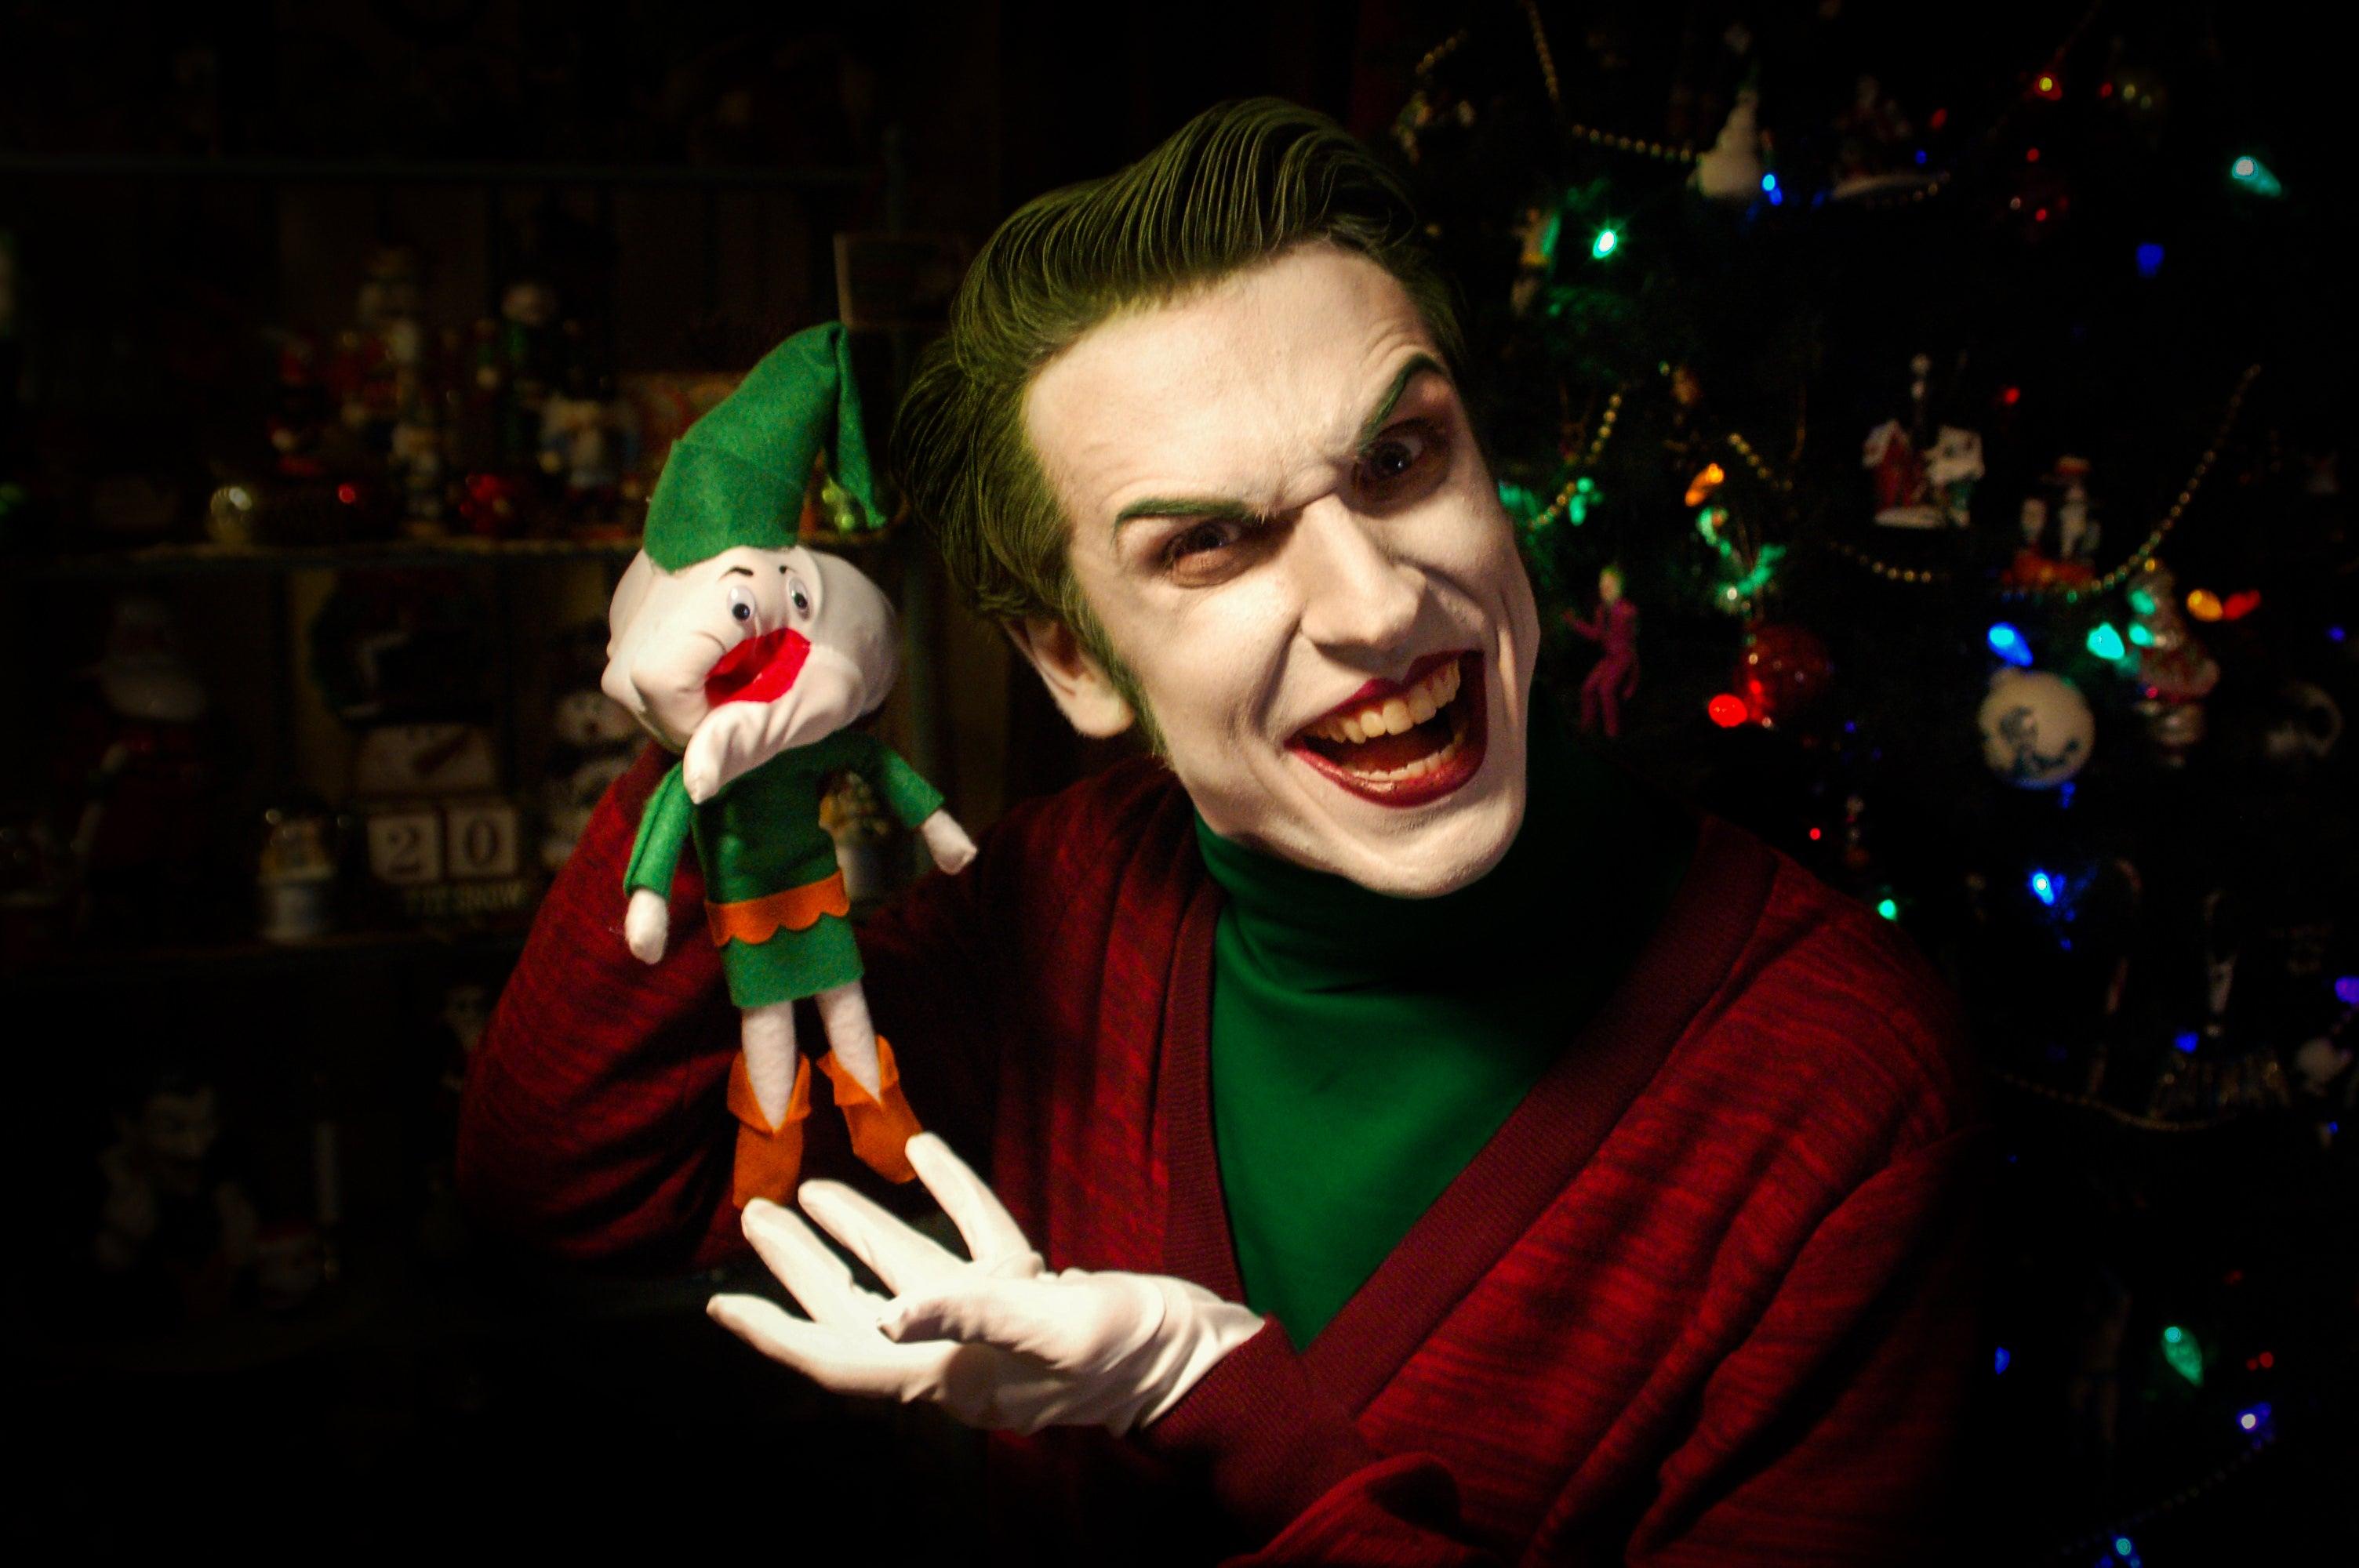 Joker Christmas.The Joker Wishes You All A Very Scary Christmas Kotaku